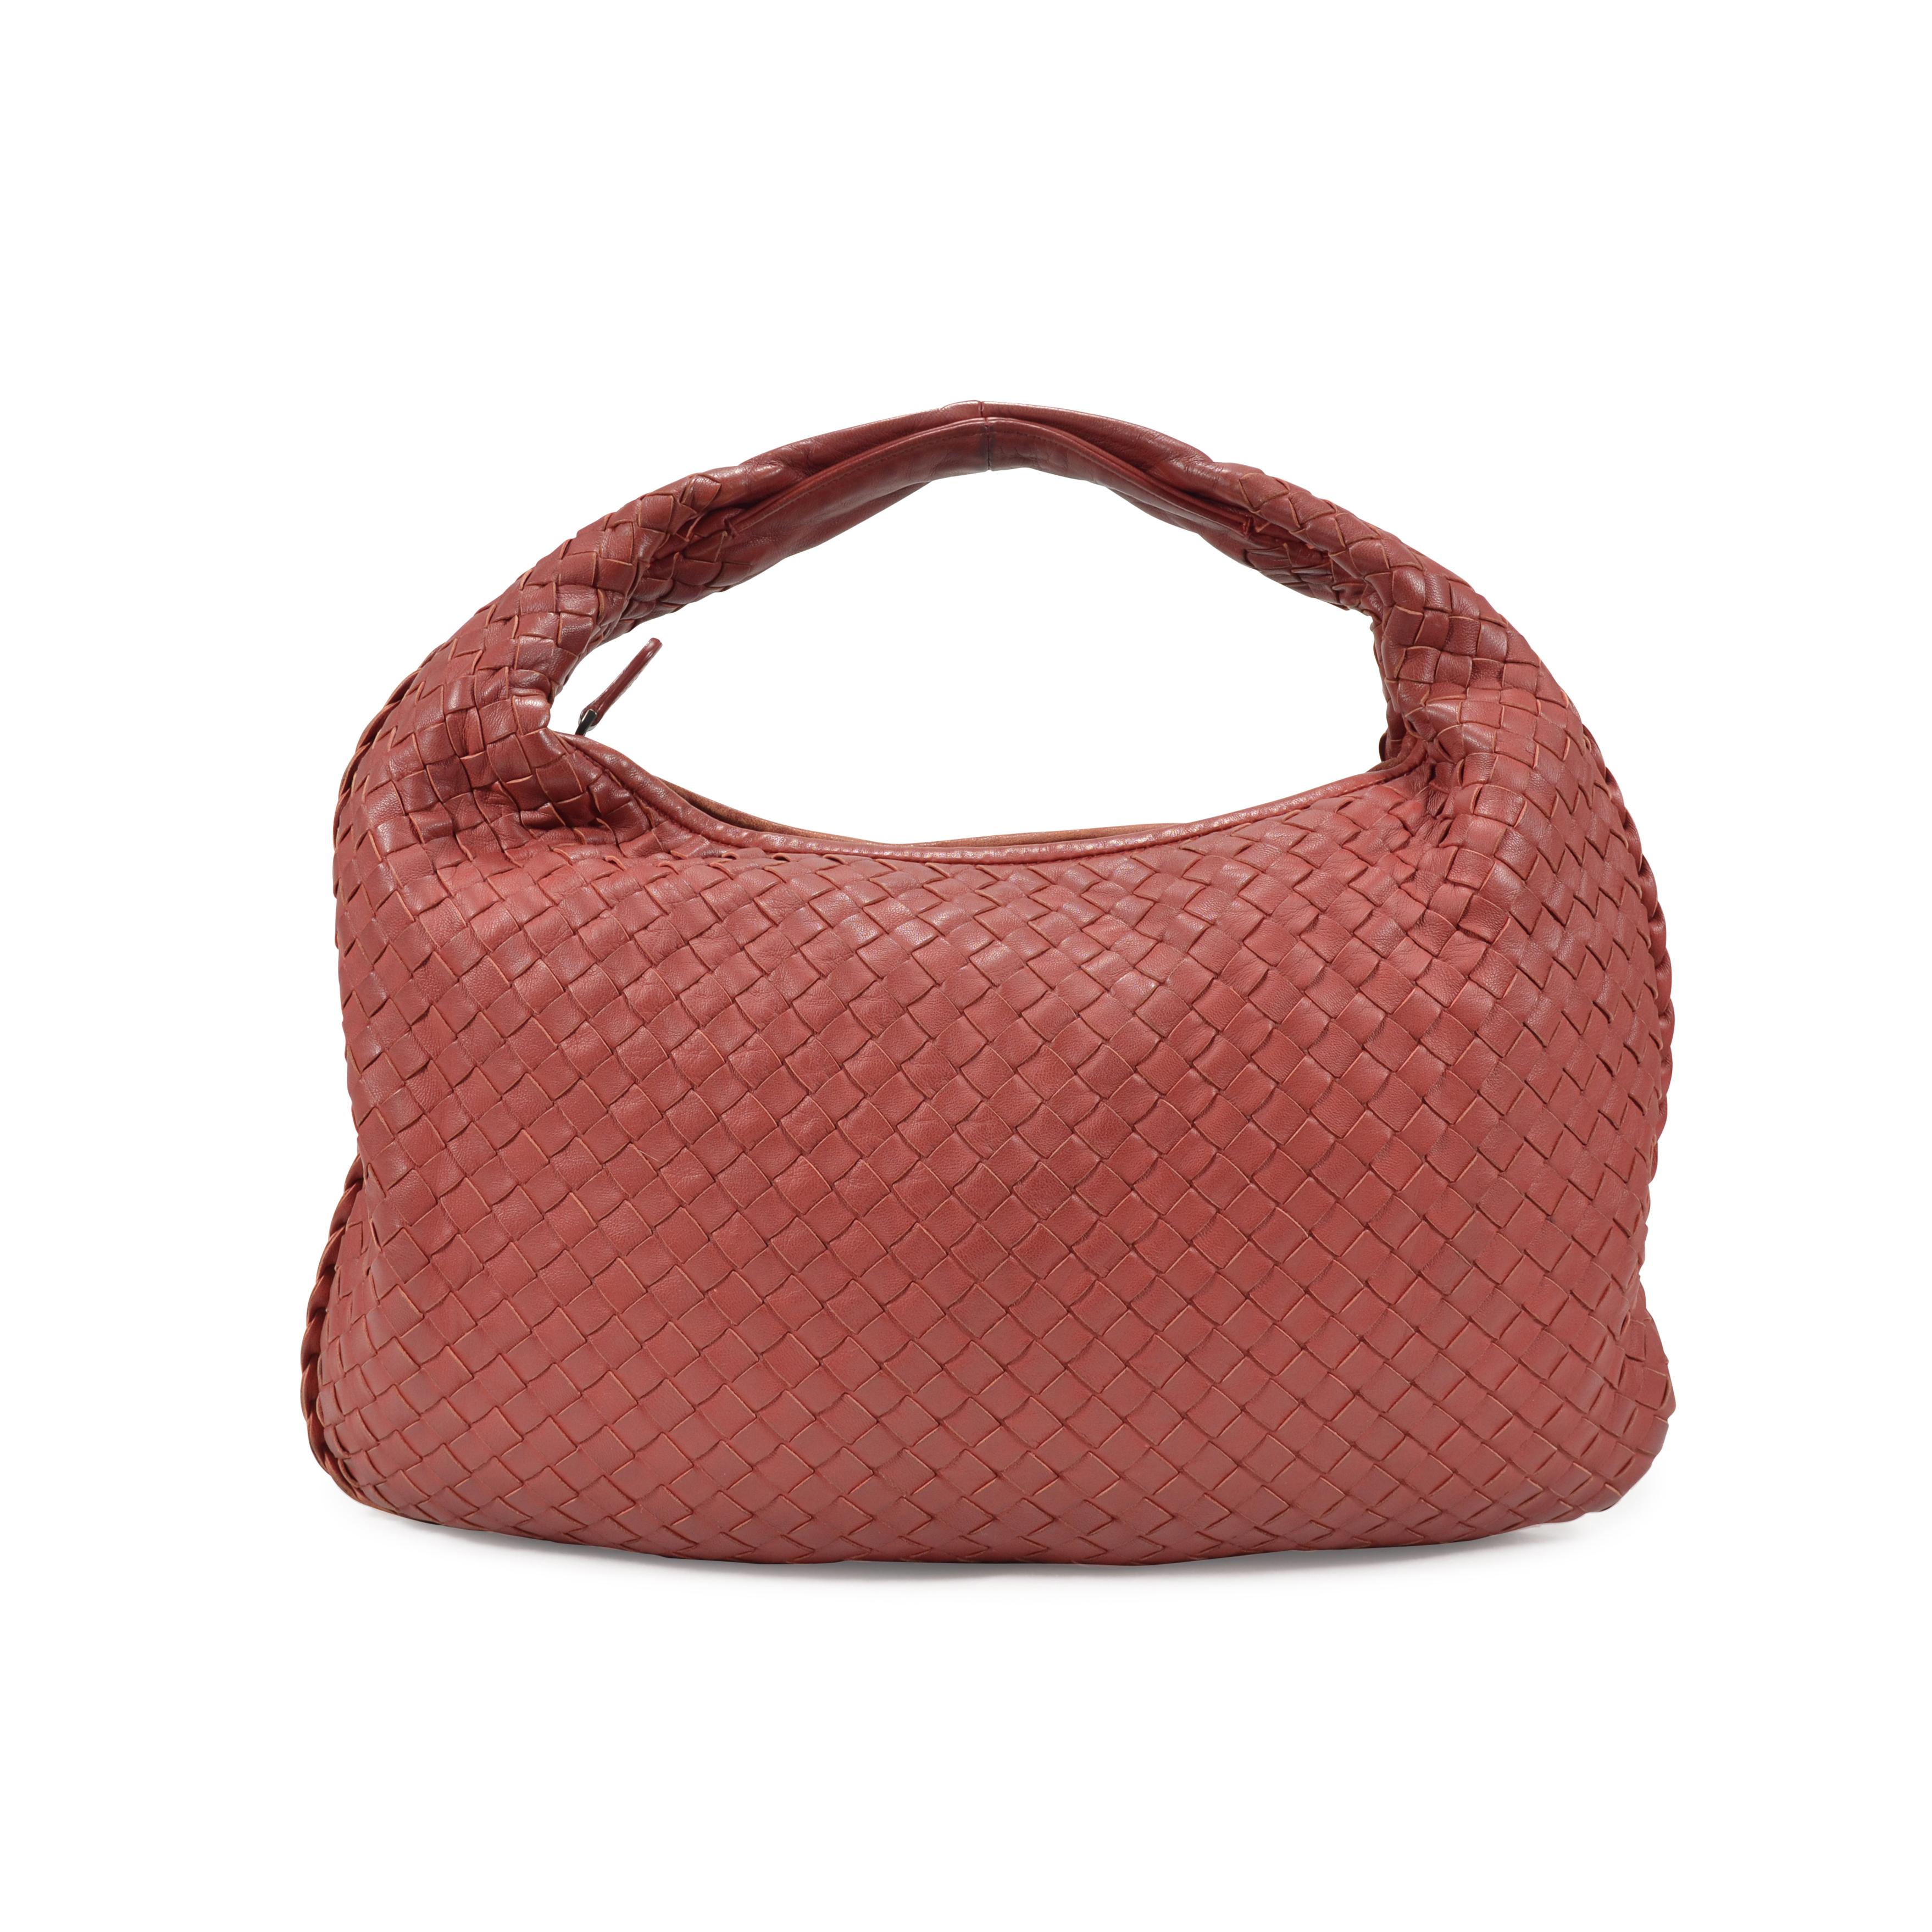 32ab0f1bdc Authentic Second Hand Bottega Veneta Intrecciato Leather Weave Hobo Bag  (PSS-021-00009)